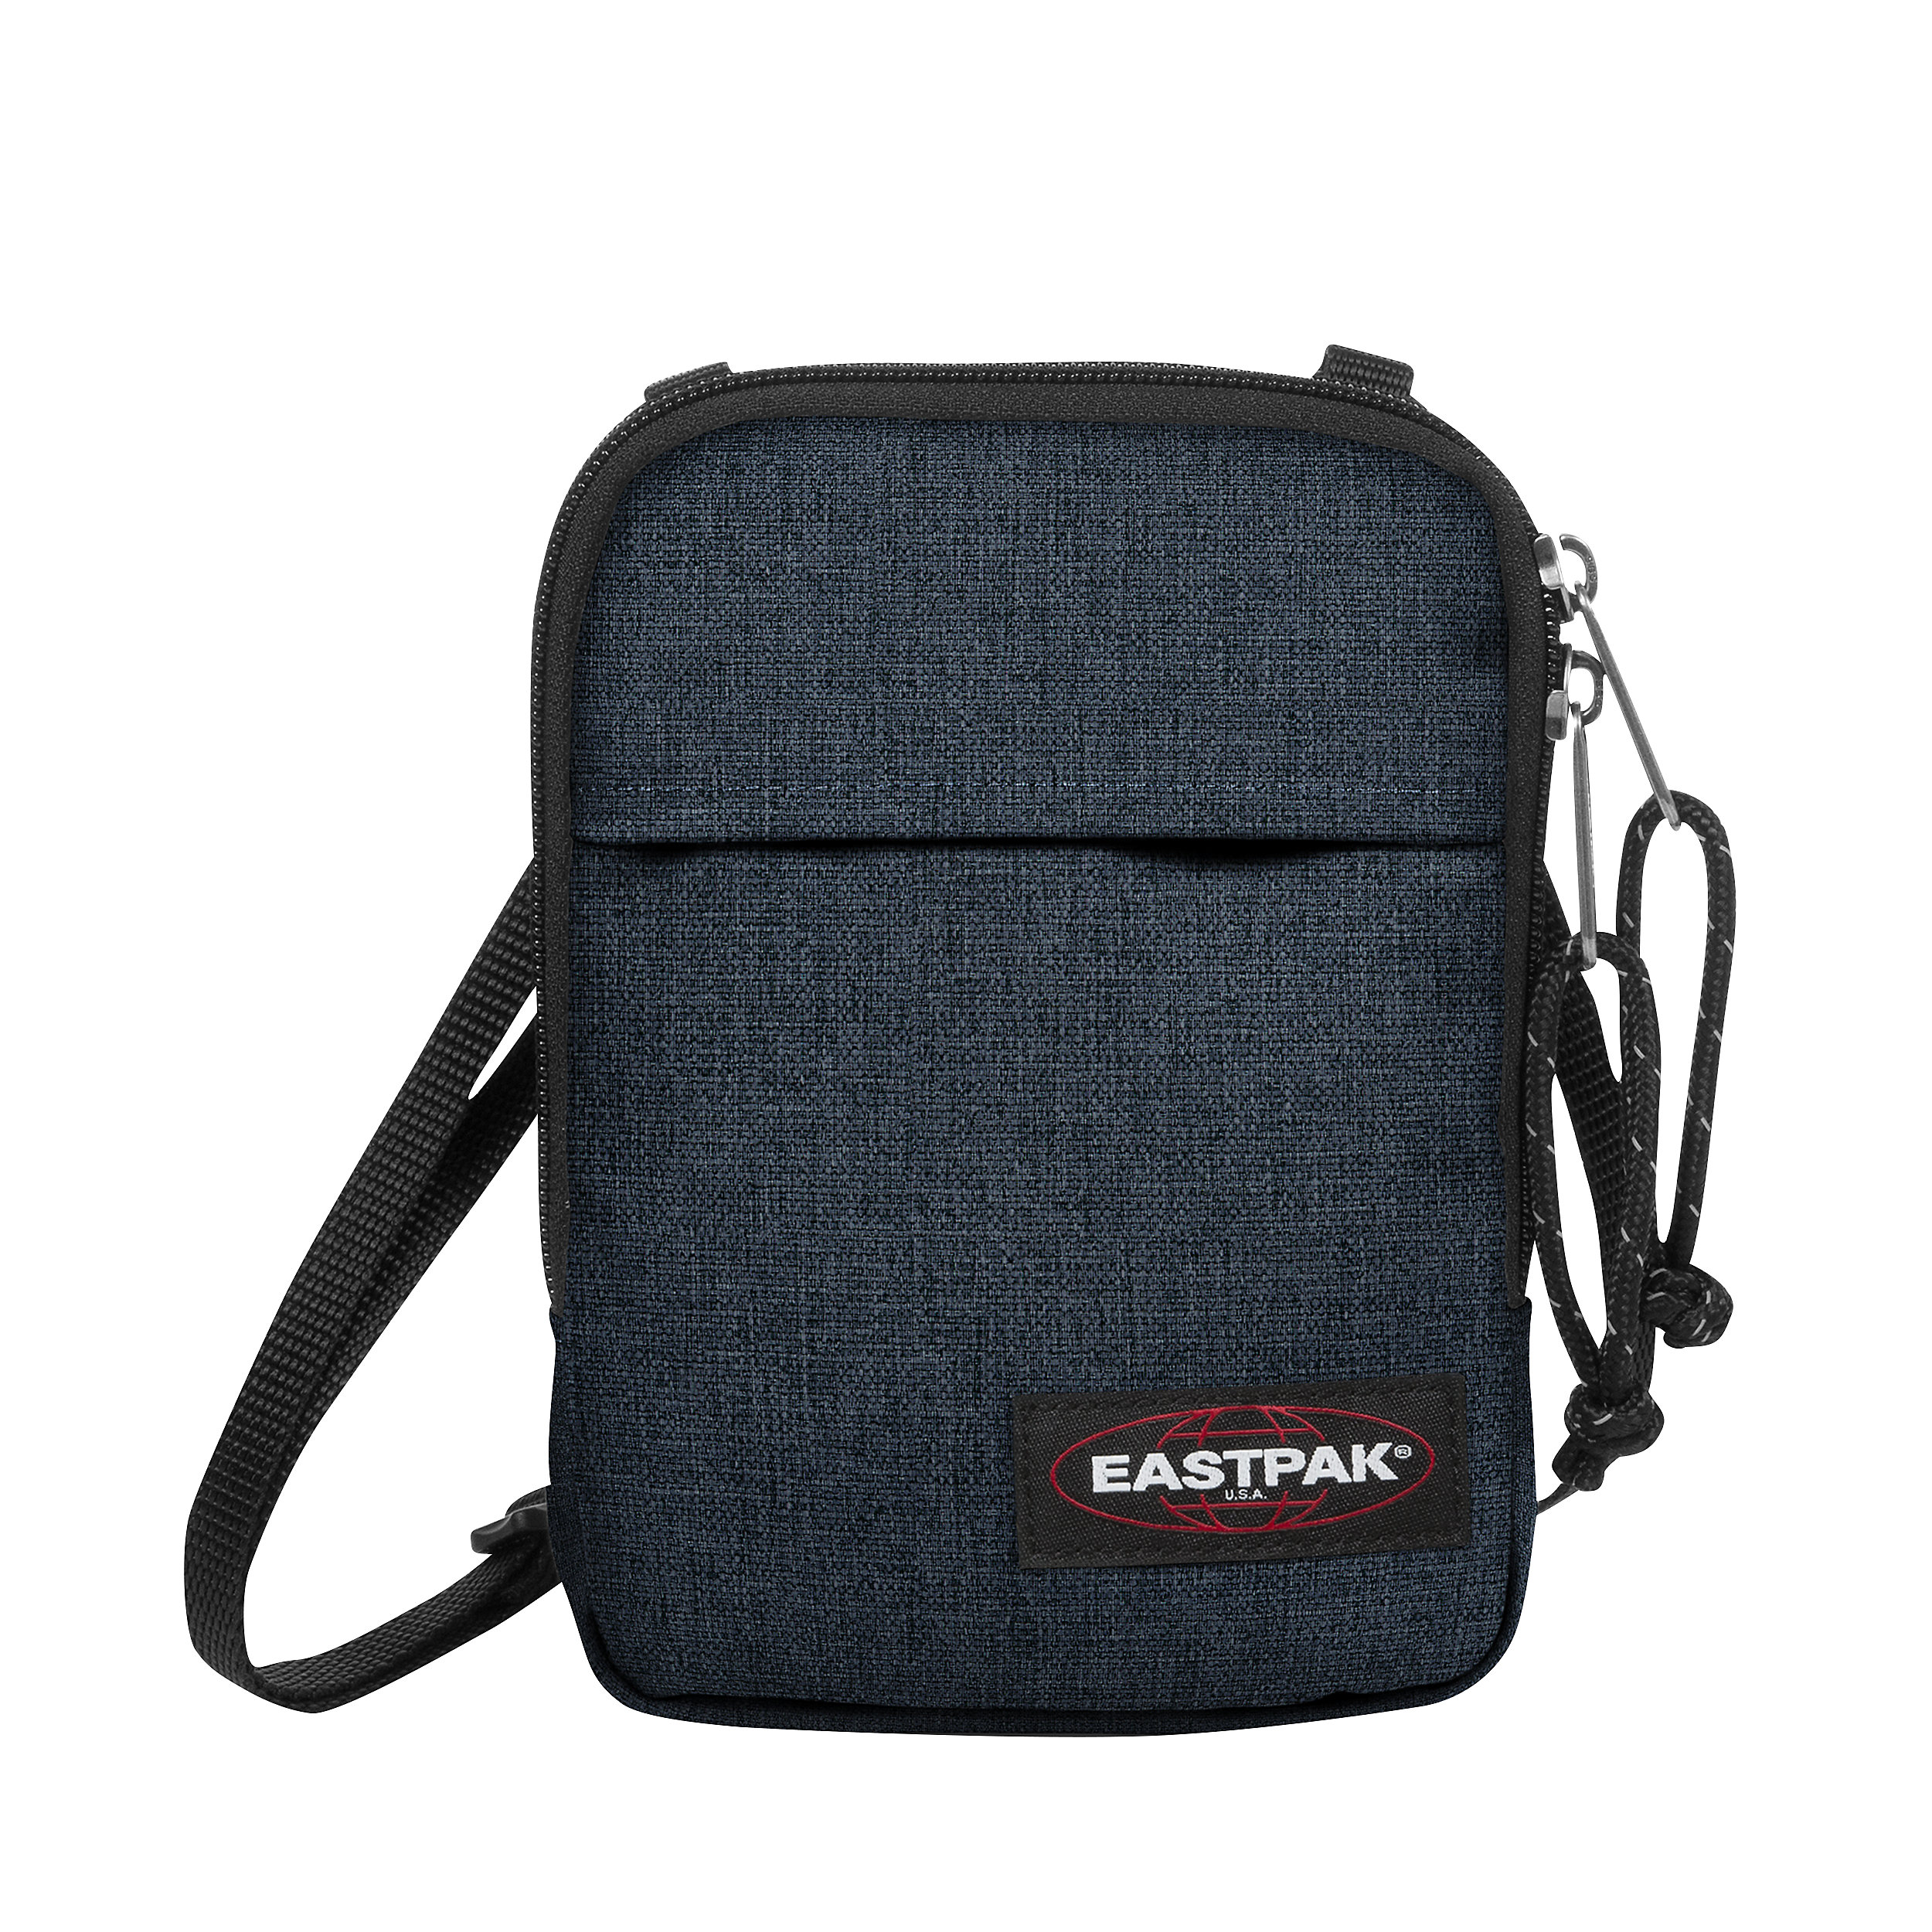 Crossbody Bag Buddy Authentic 0.5 Liter